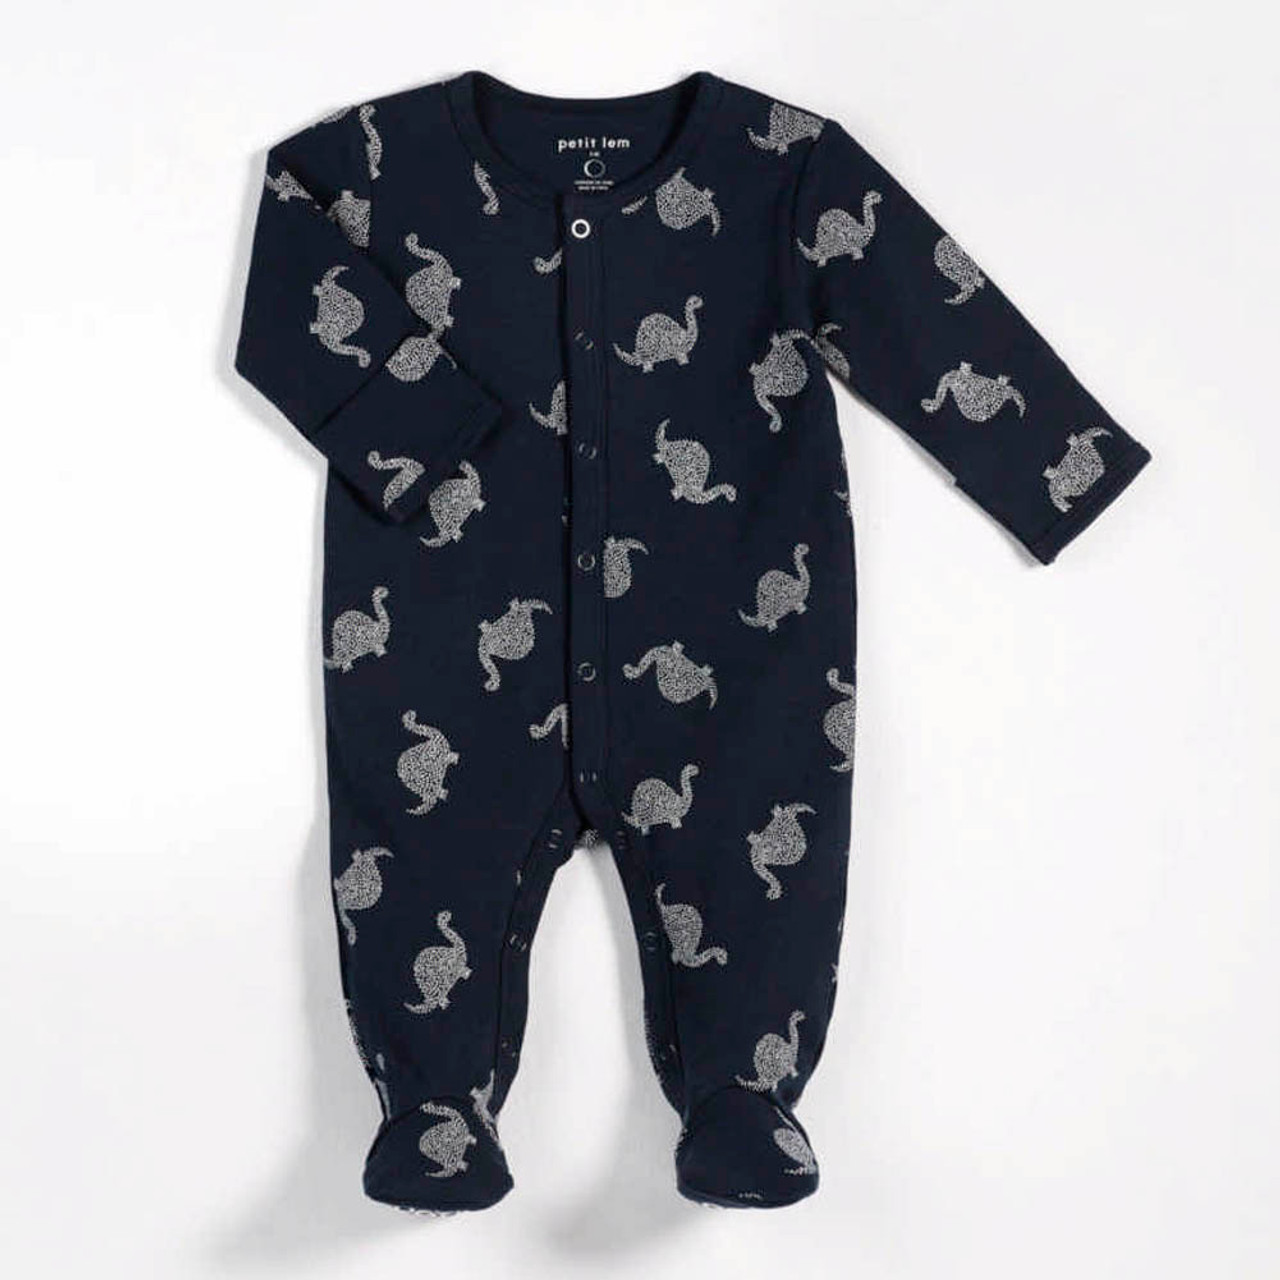 2da4c935c Petit Lem Organic Cotton Sleeper - Oh Dino Navy (9 Months) - Dear ...